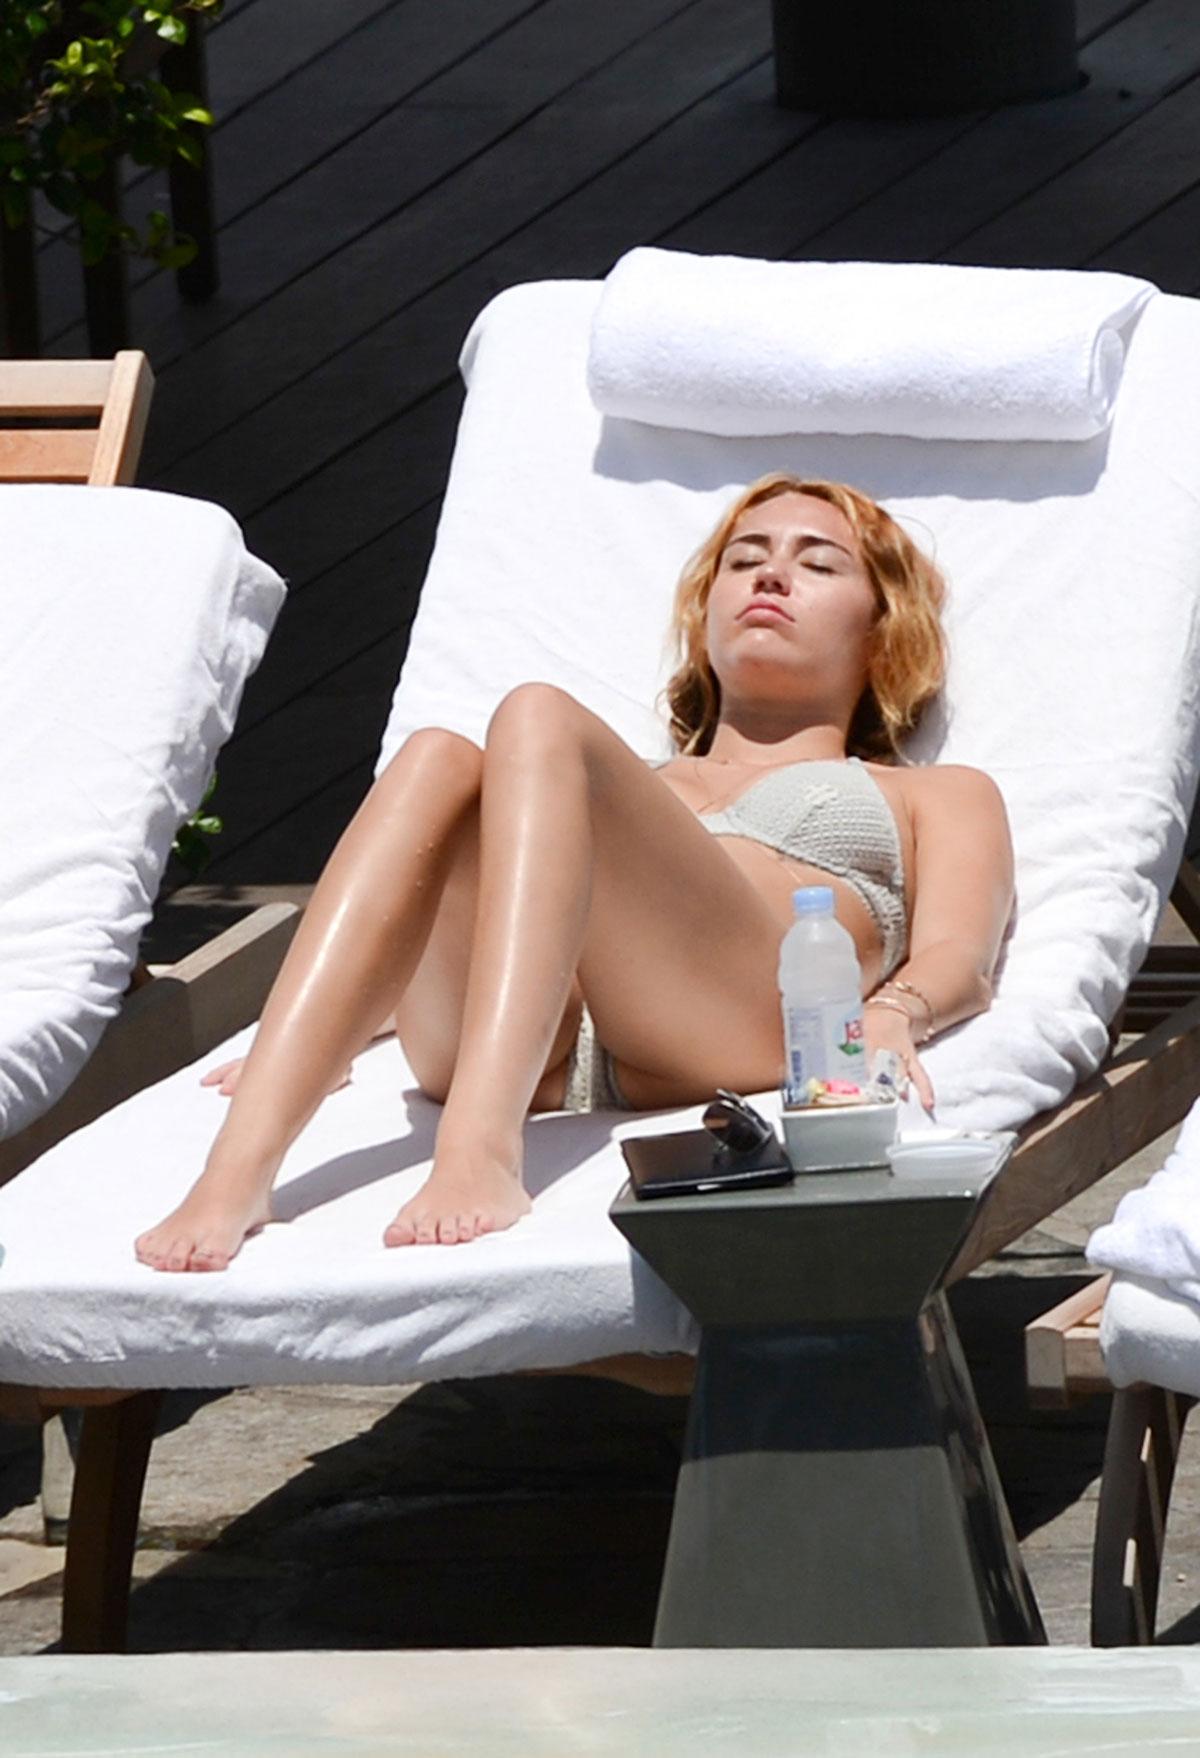 Miley cyrus bikini pool share your